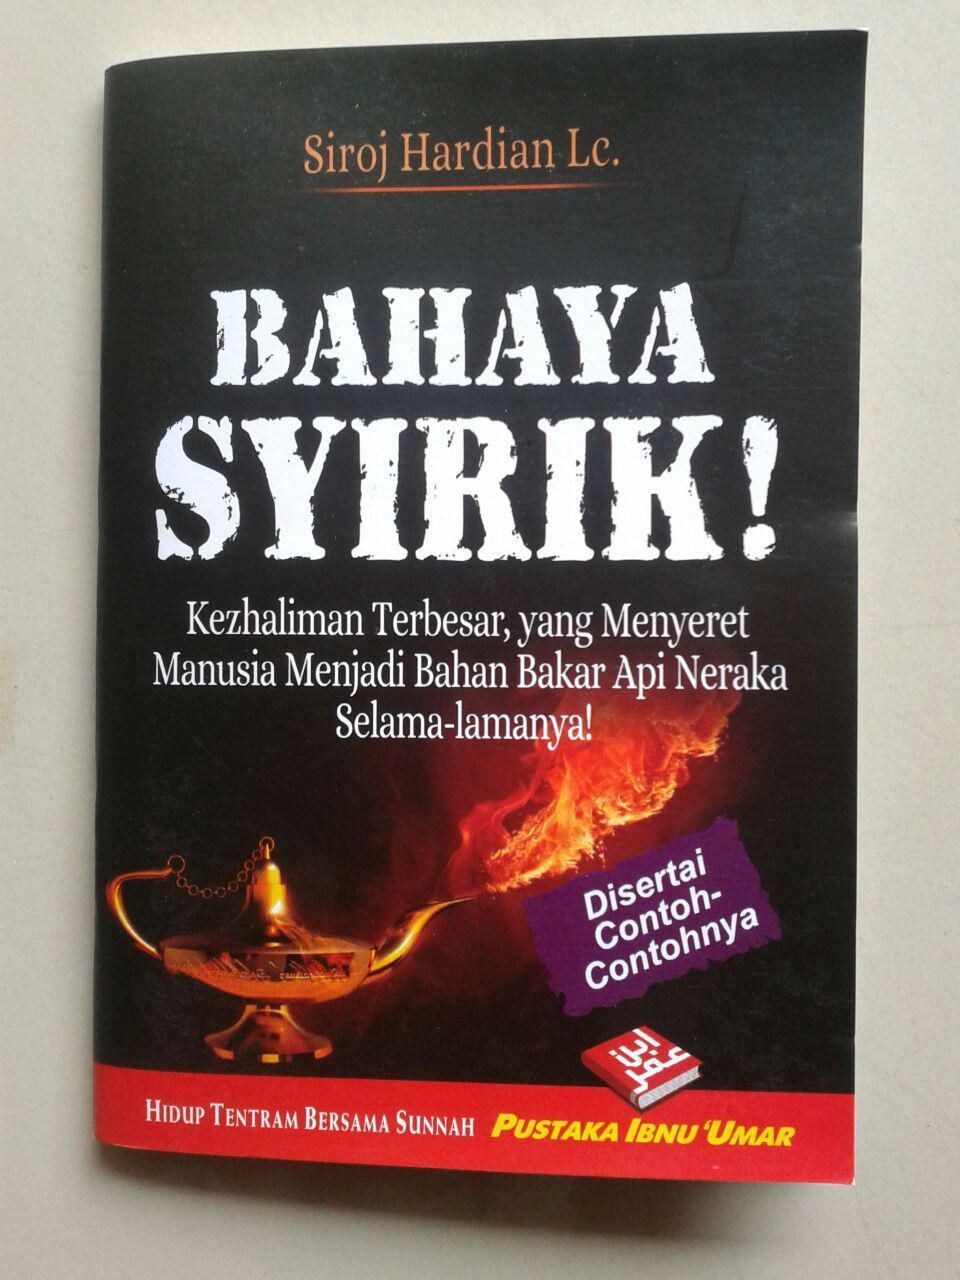 Buku Saku Bahaya Syirik Kezhaliman Terbesar cover 2